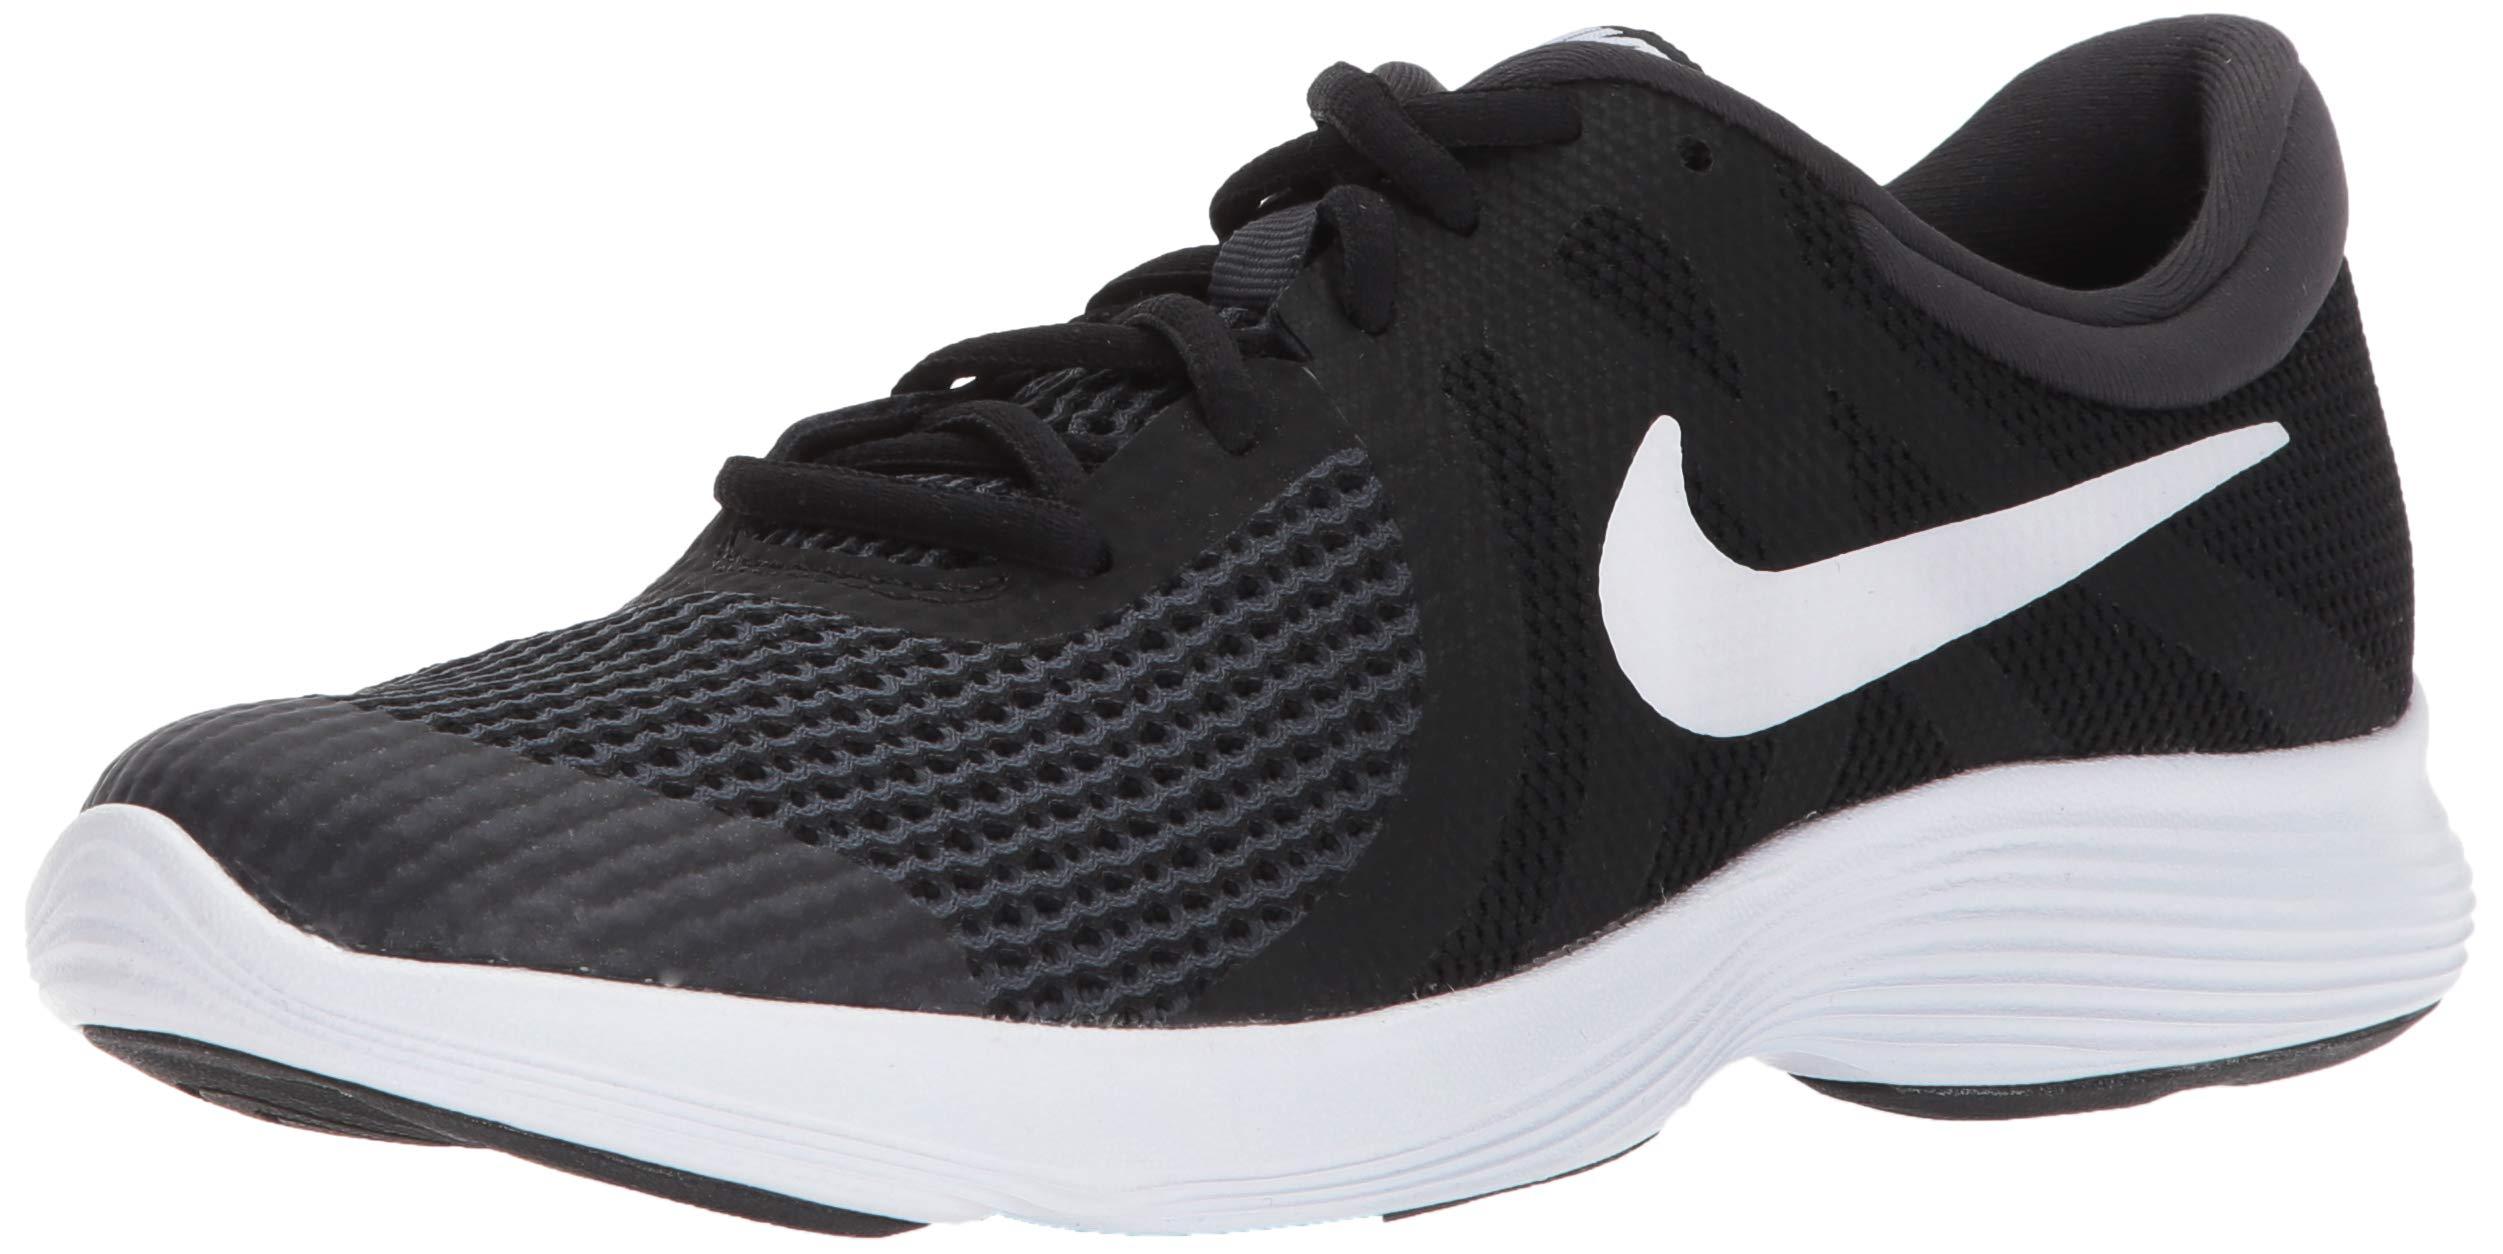 Nike Boys' Revolution 4 (GS) Running Shoe, Black/White-Anthracite, 6Y Youth US Big Kid